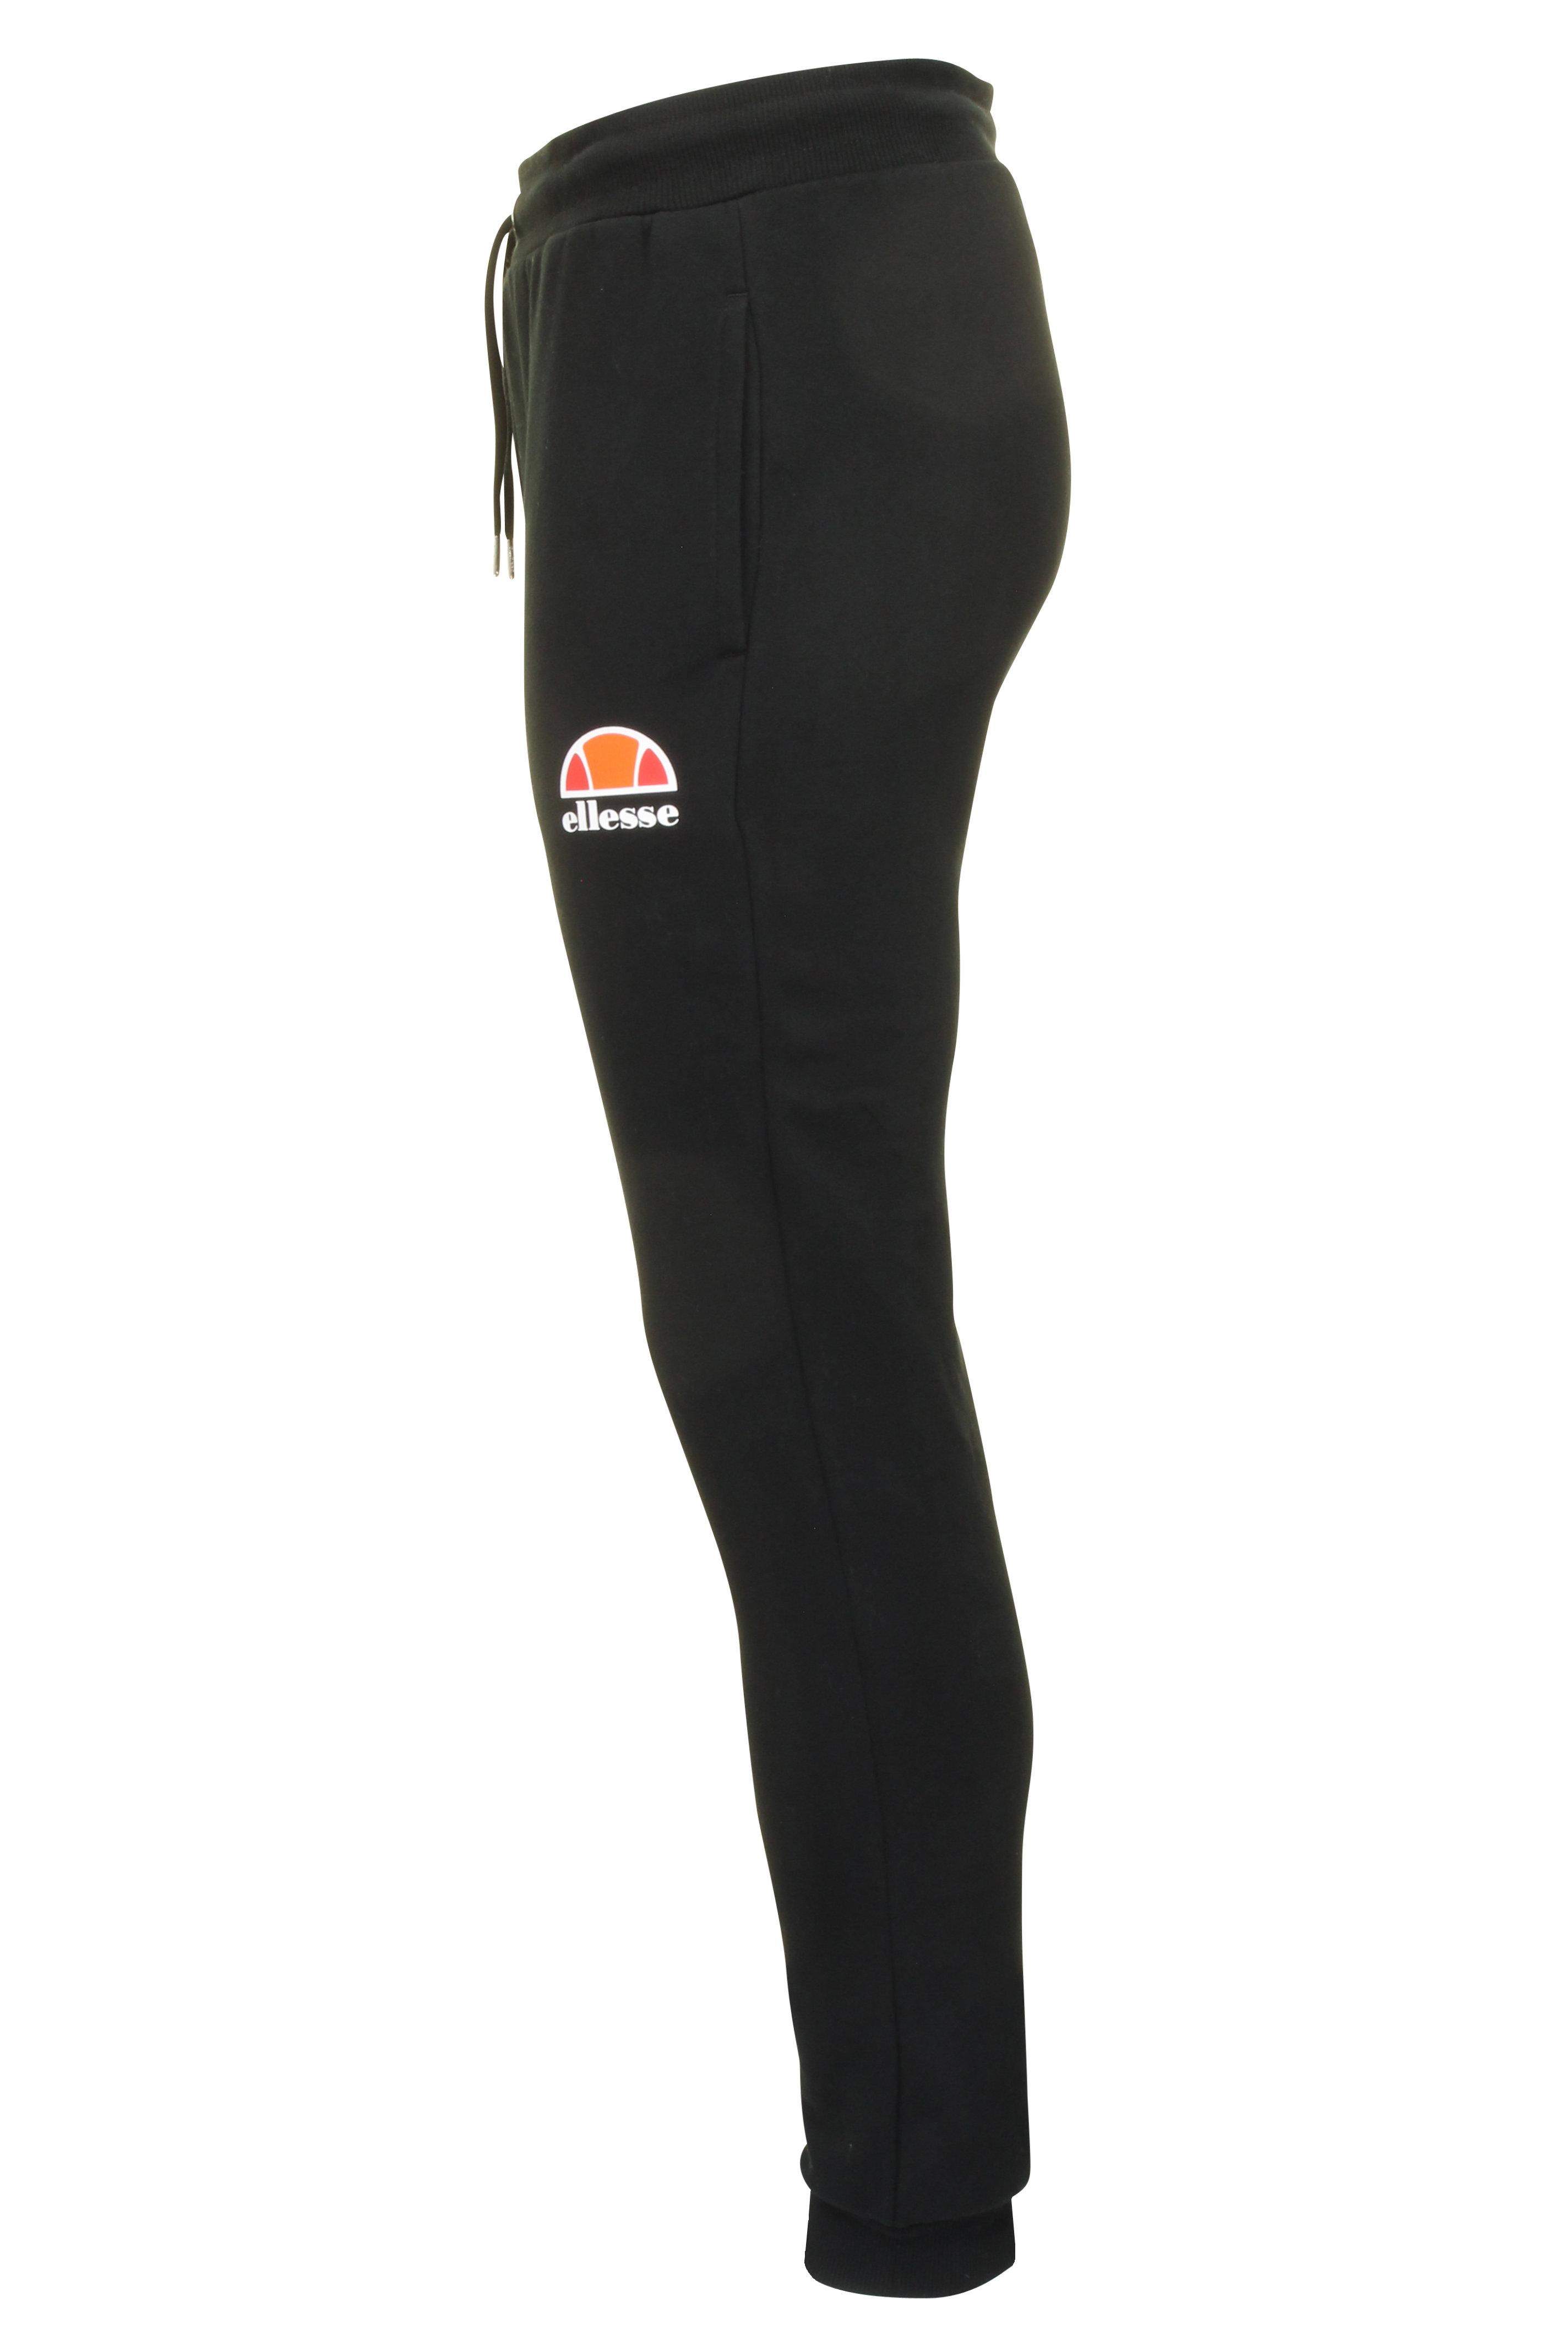 Ellesse-Da-Uomo-Pantaloni-Sportivi-Jog-Pantaloni-con-logo-034-Ovest-034 miniatura 4